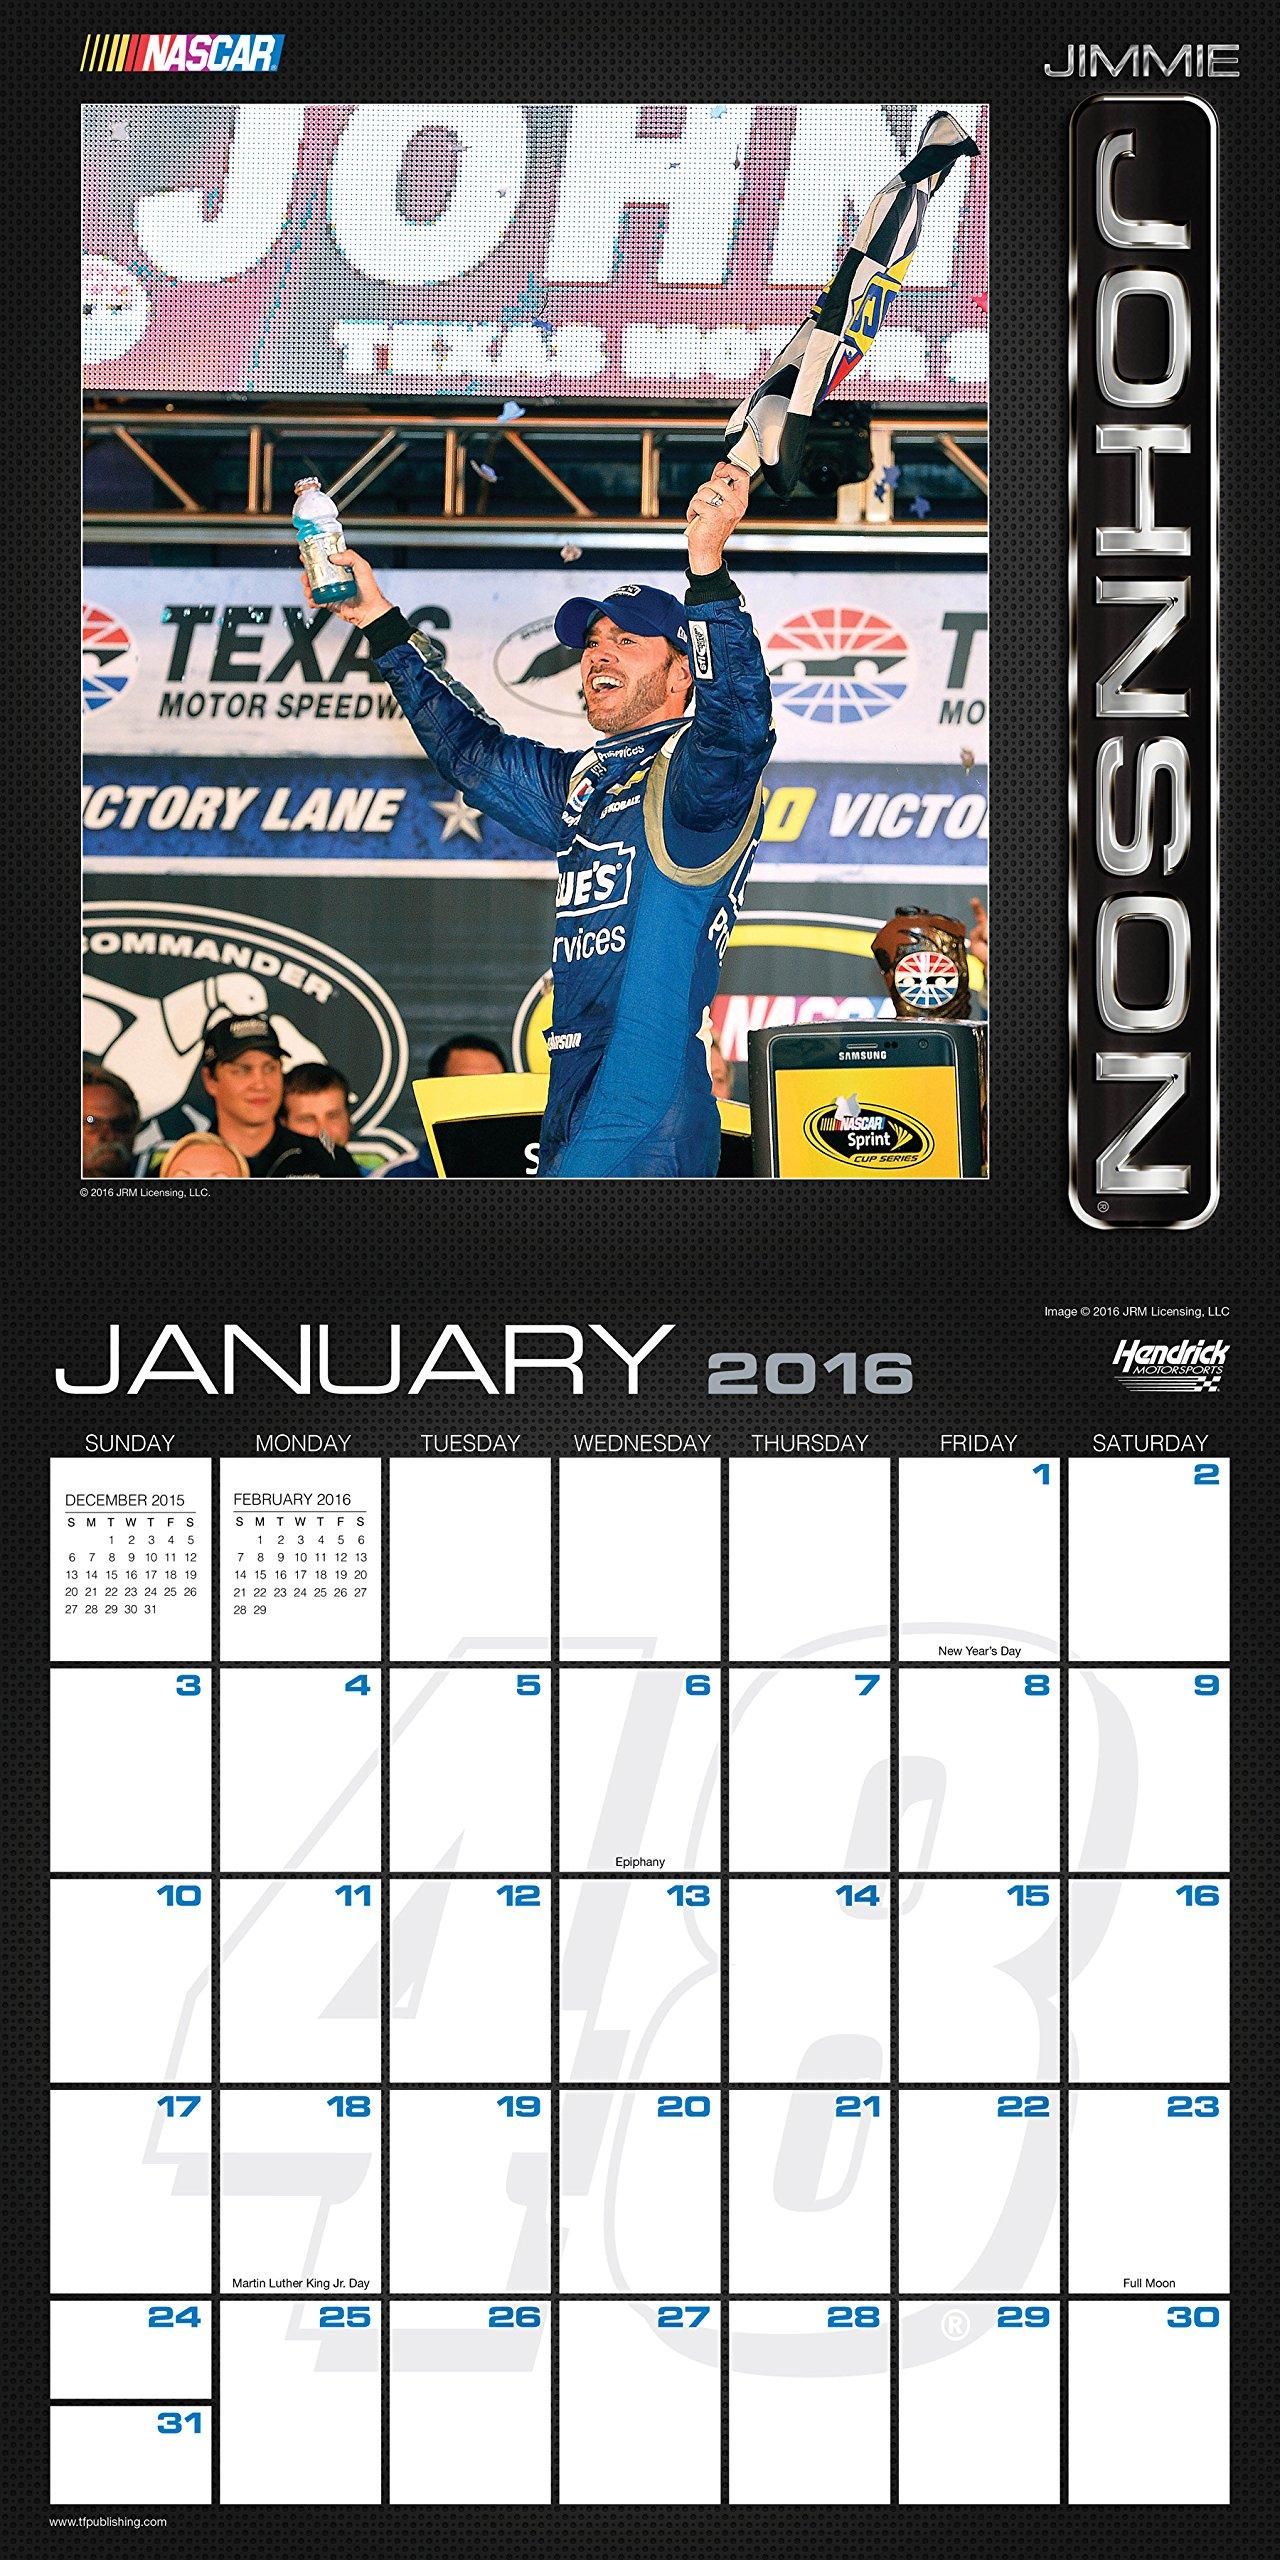 2016 Stars of NASCAR Wall Calendar: Nascar: 9781624381546: Amazon.com: Books